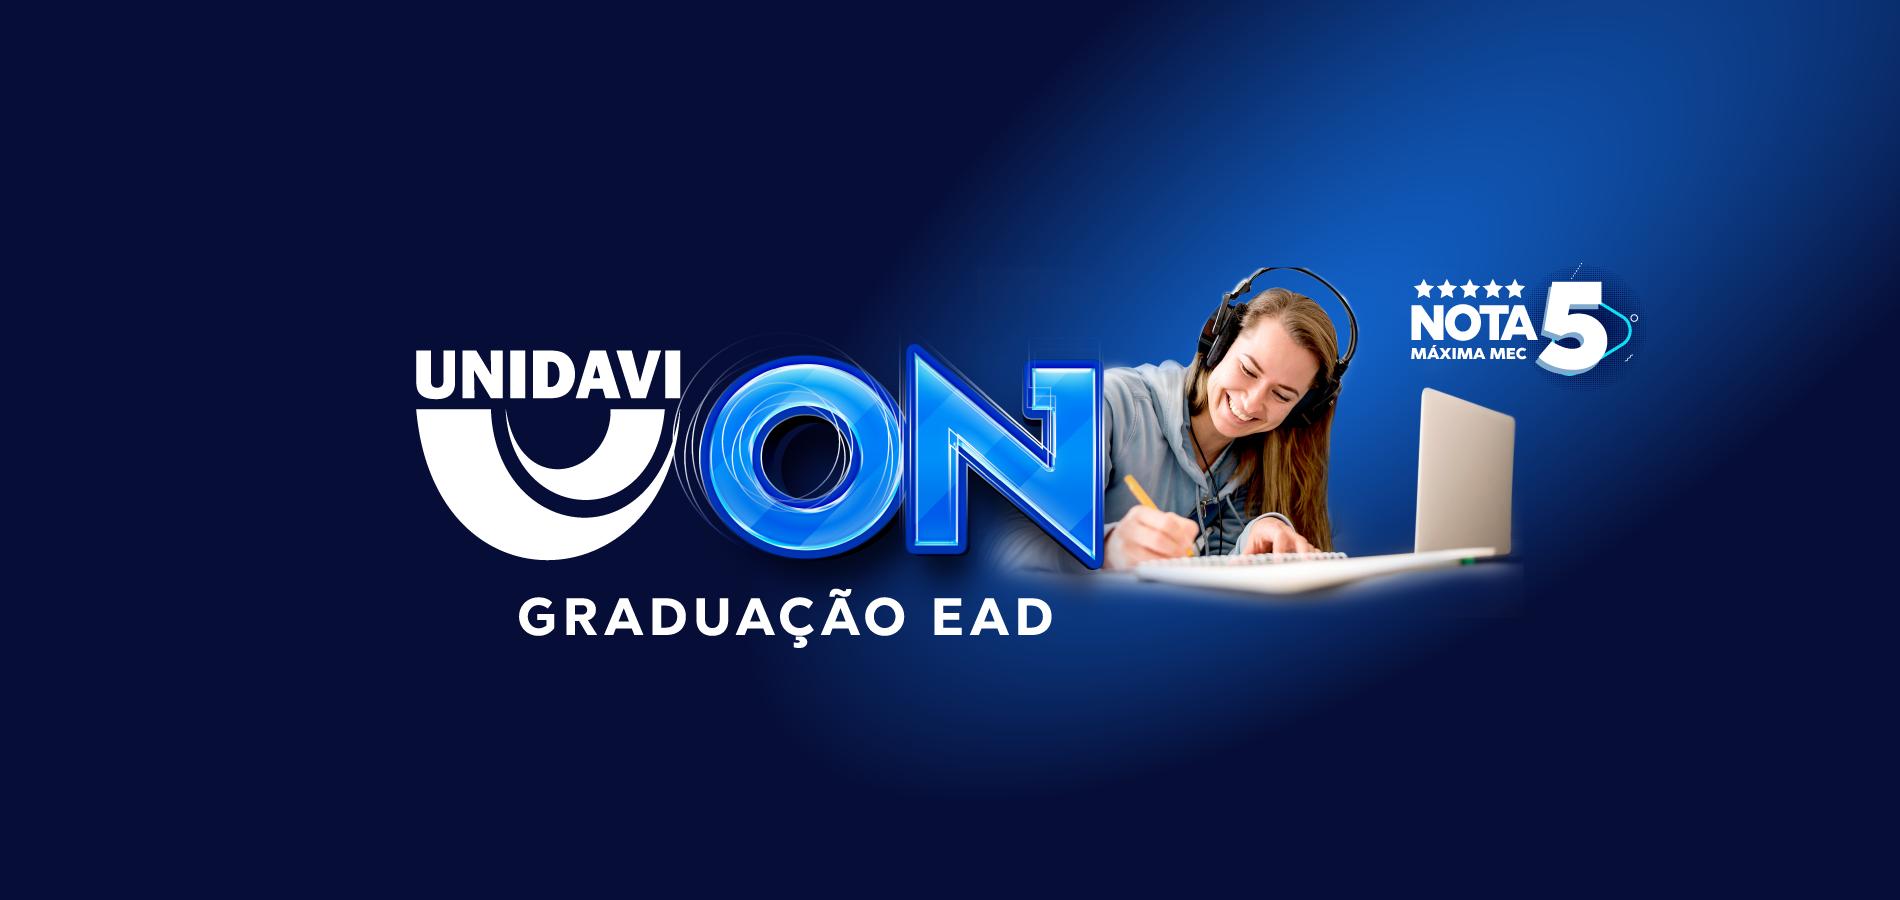 Imagem 1 - Banner Unidavi On